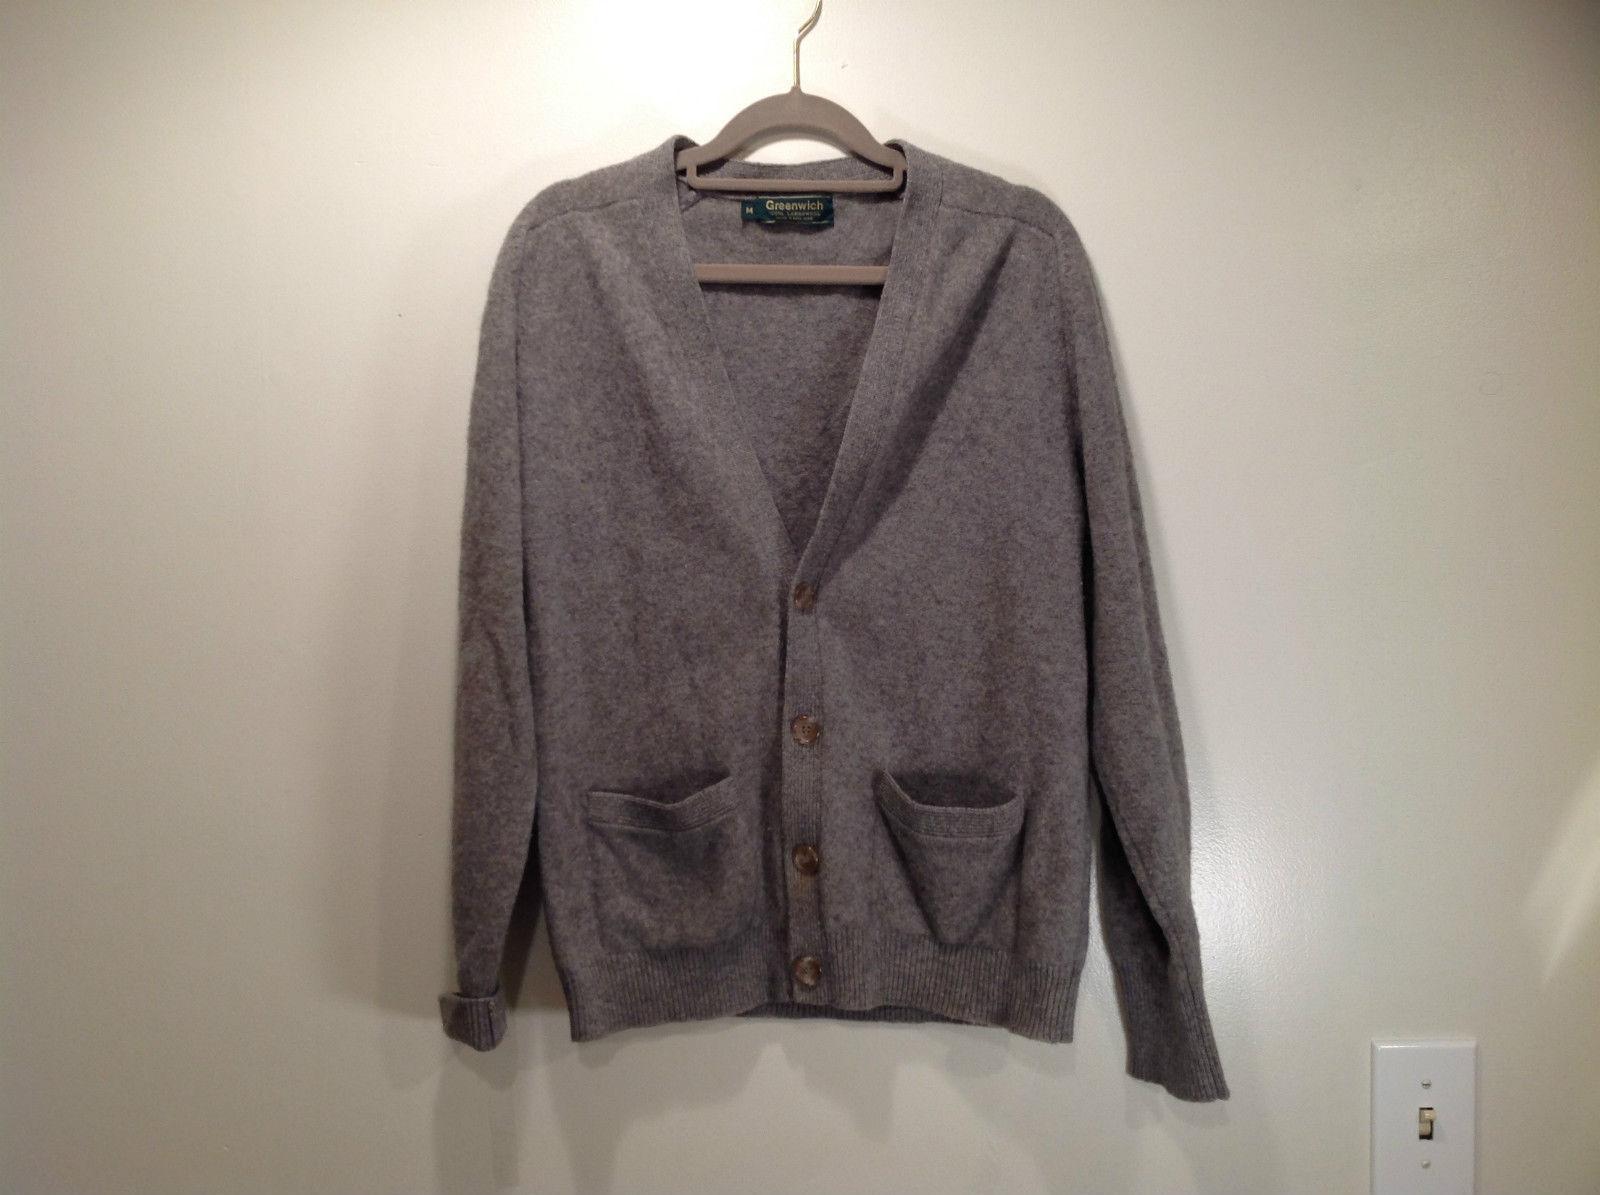 Greenwich 100 Percent Lambs Wool Gray Cardigan Size M Soft Fuzzy Fabric